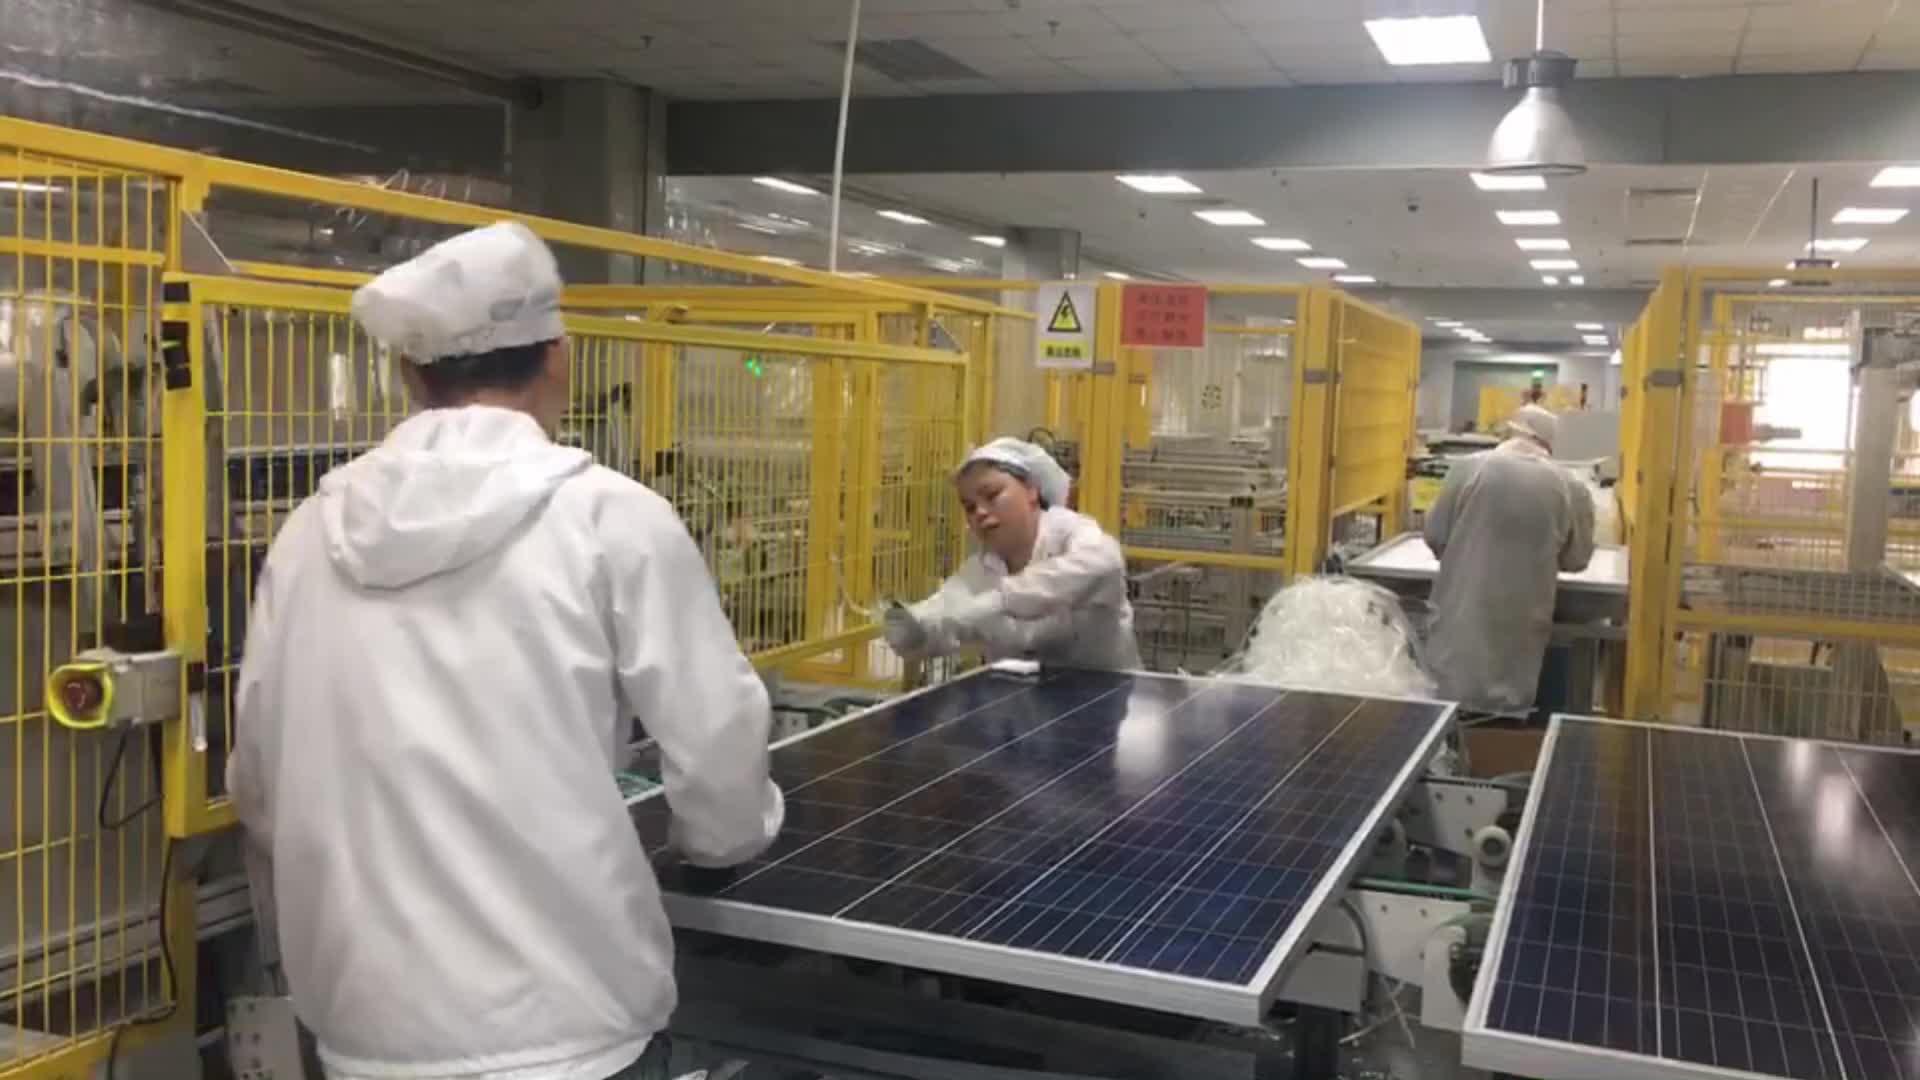 Sunpower Solar Panel System Home 36v 300w Mono Solar Panels Price India For  Sale - Buy Cheap Solar Panels For Sale,Single Solar Panel 500w,Solarpanel